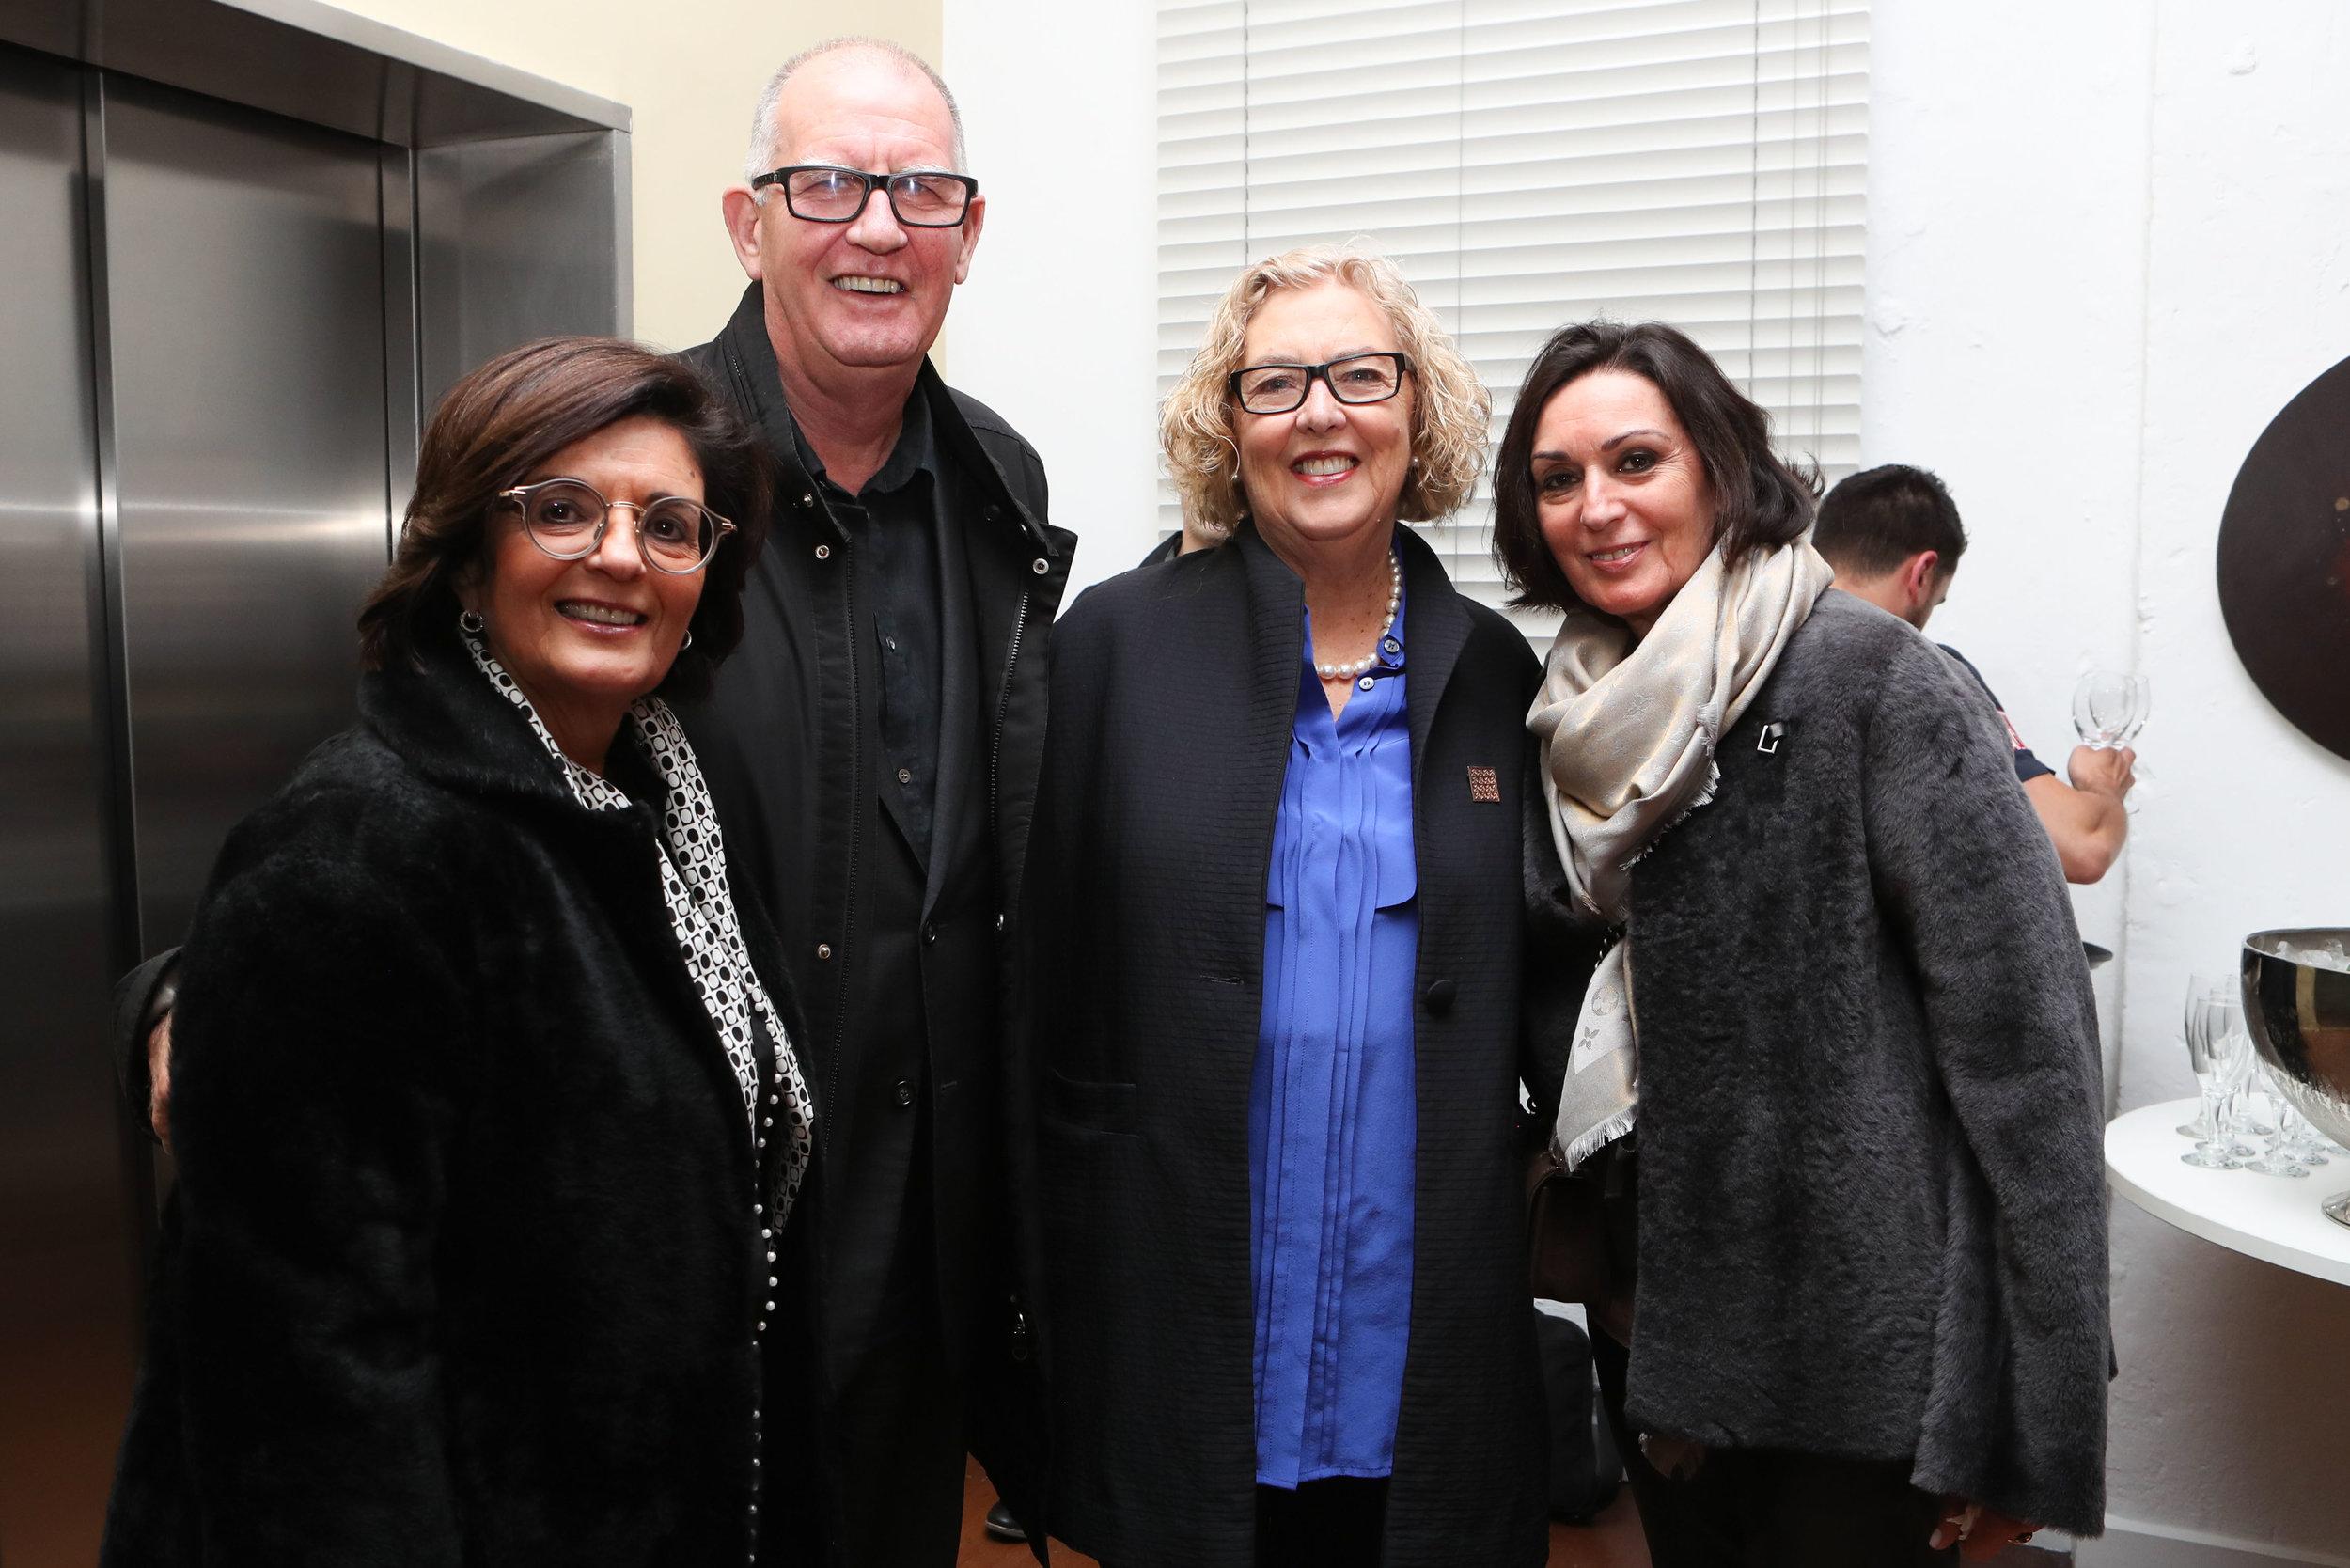 Shirley Bialek, Rodger and Kathleen Dalling and Belinda Freedman (2) .jpg